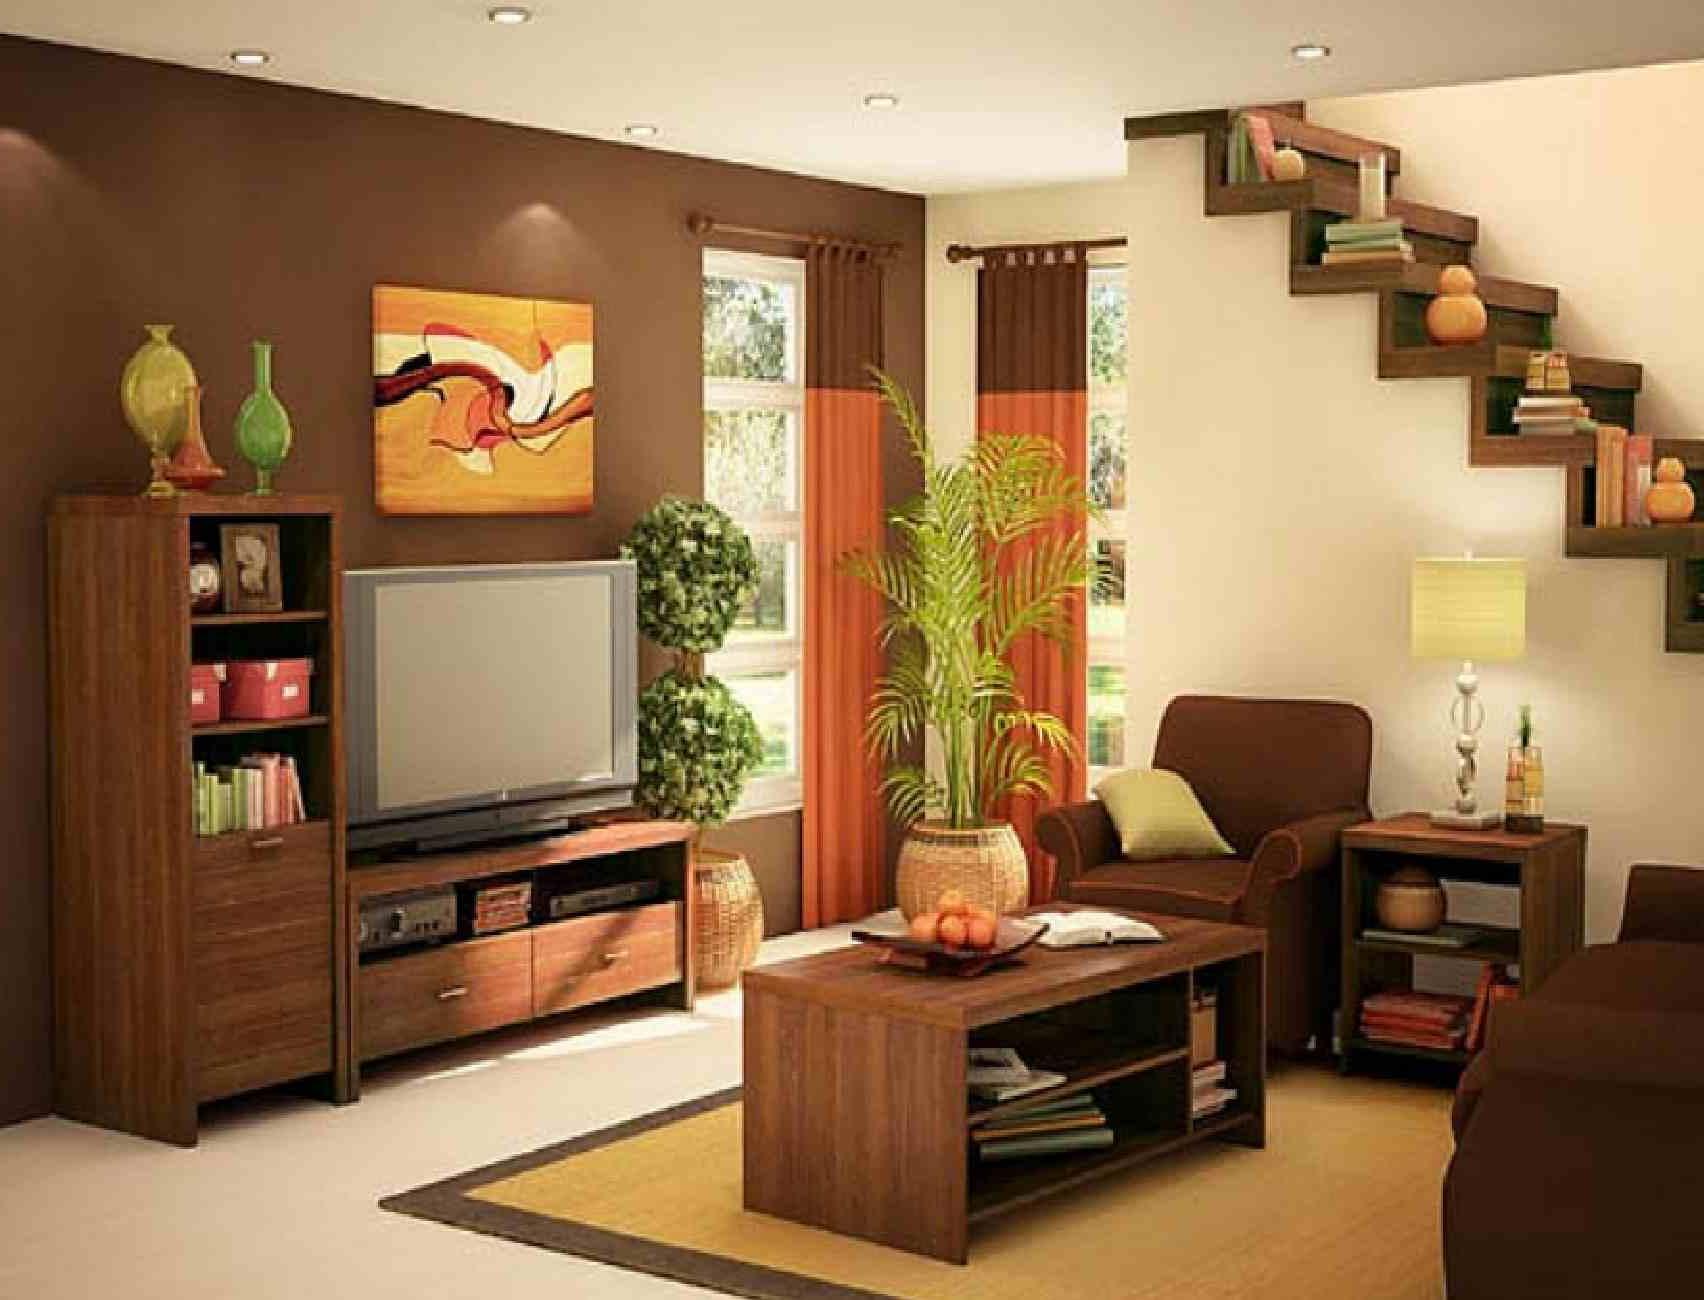 ... living room: simple interior design Indian style living room simple interior HUVWUQY